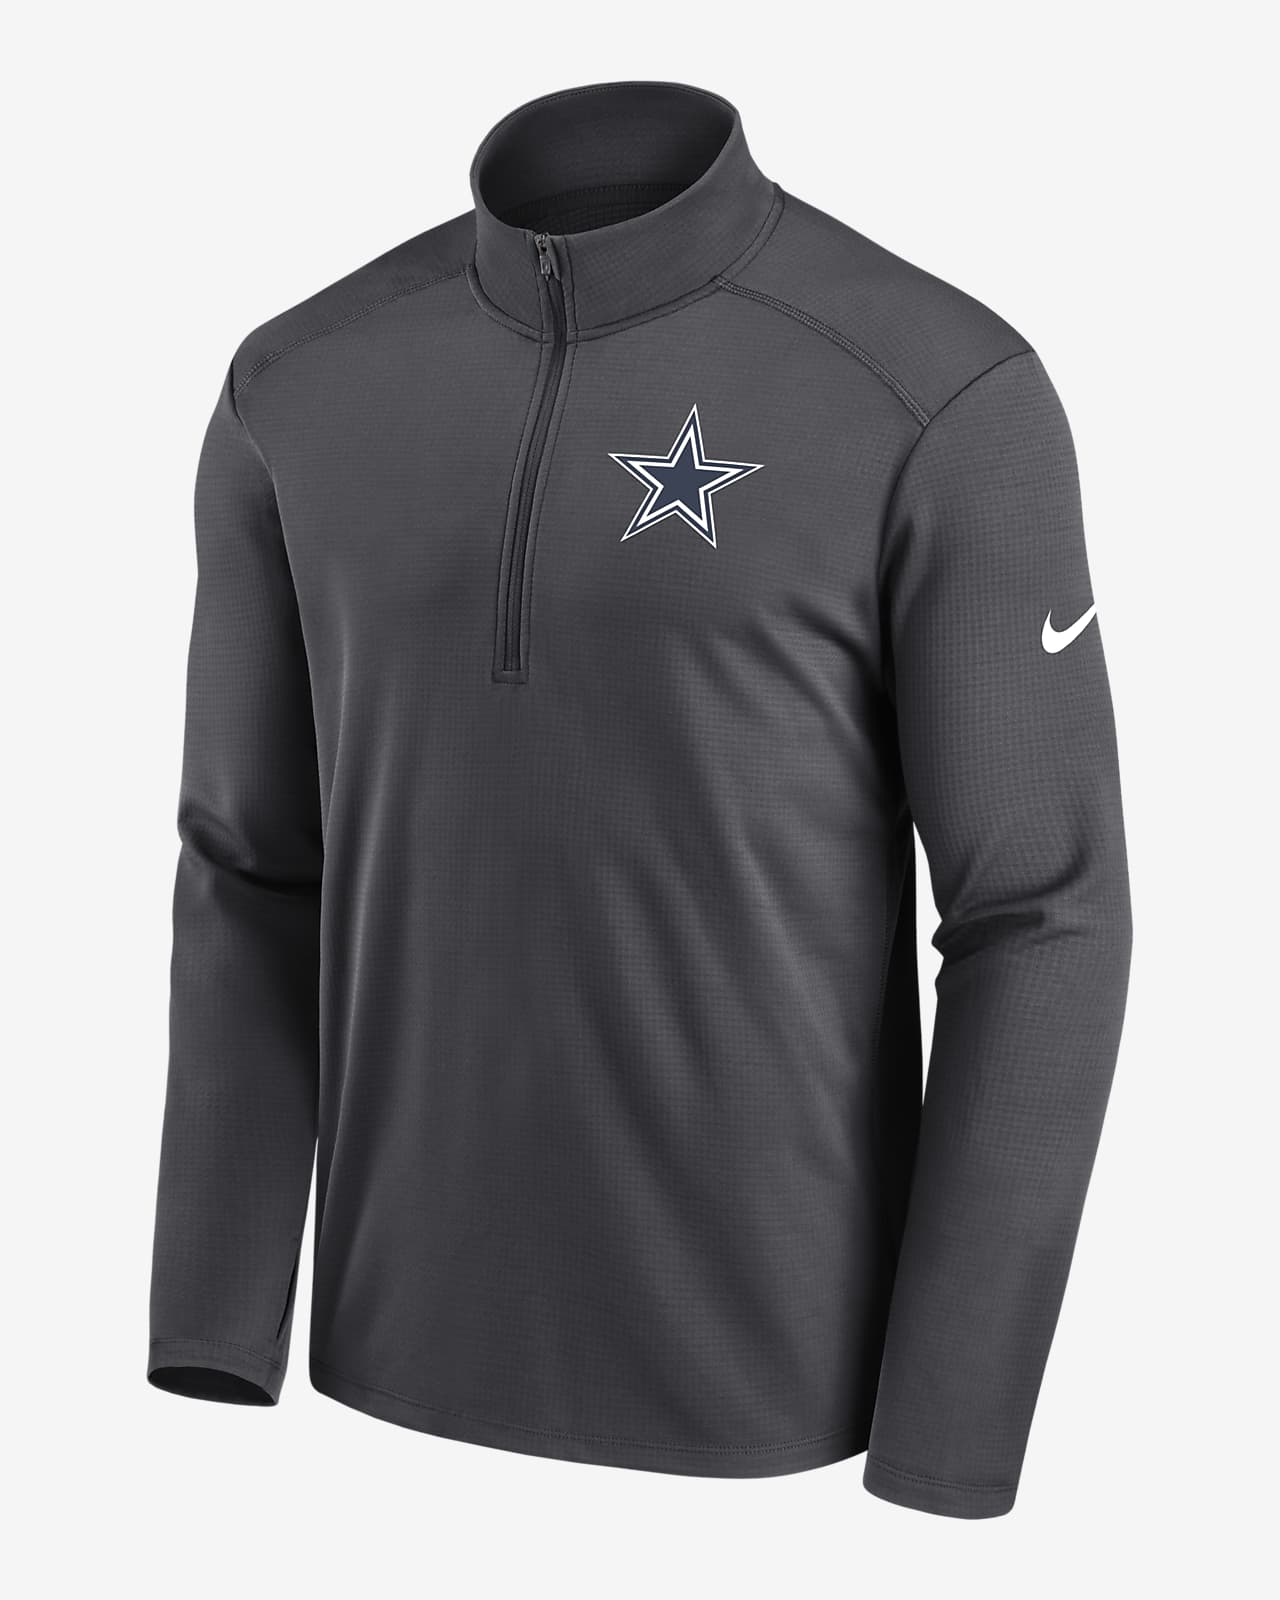 Chamarra con cierre de 1/4 para hombre Nike Dri-FIT Pacer (NFL Dallas Cowboys)